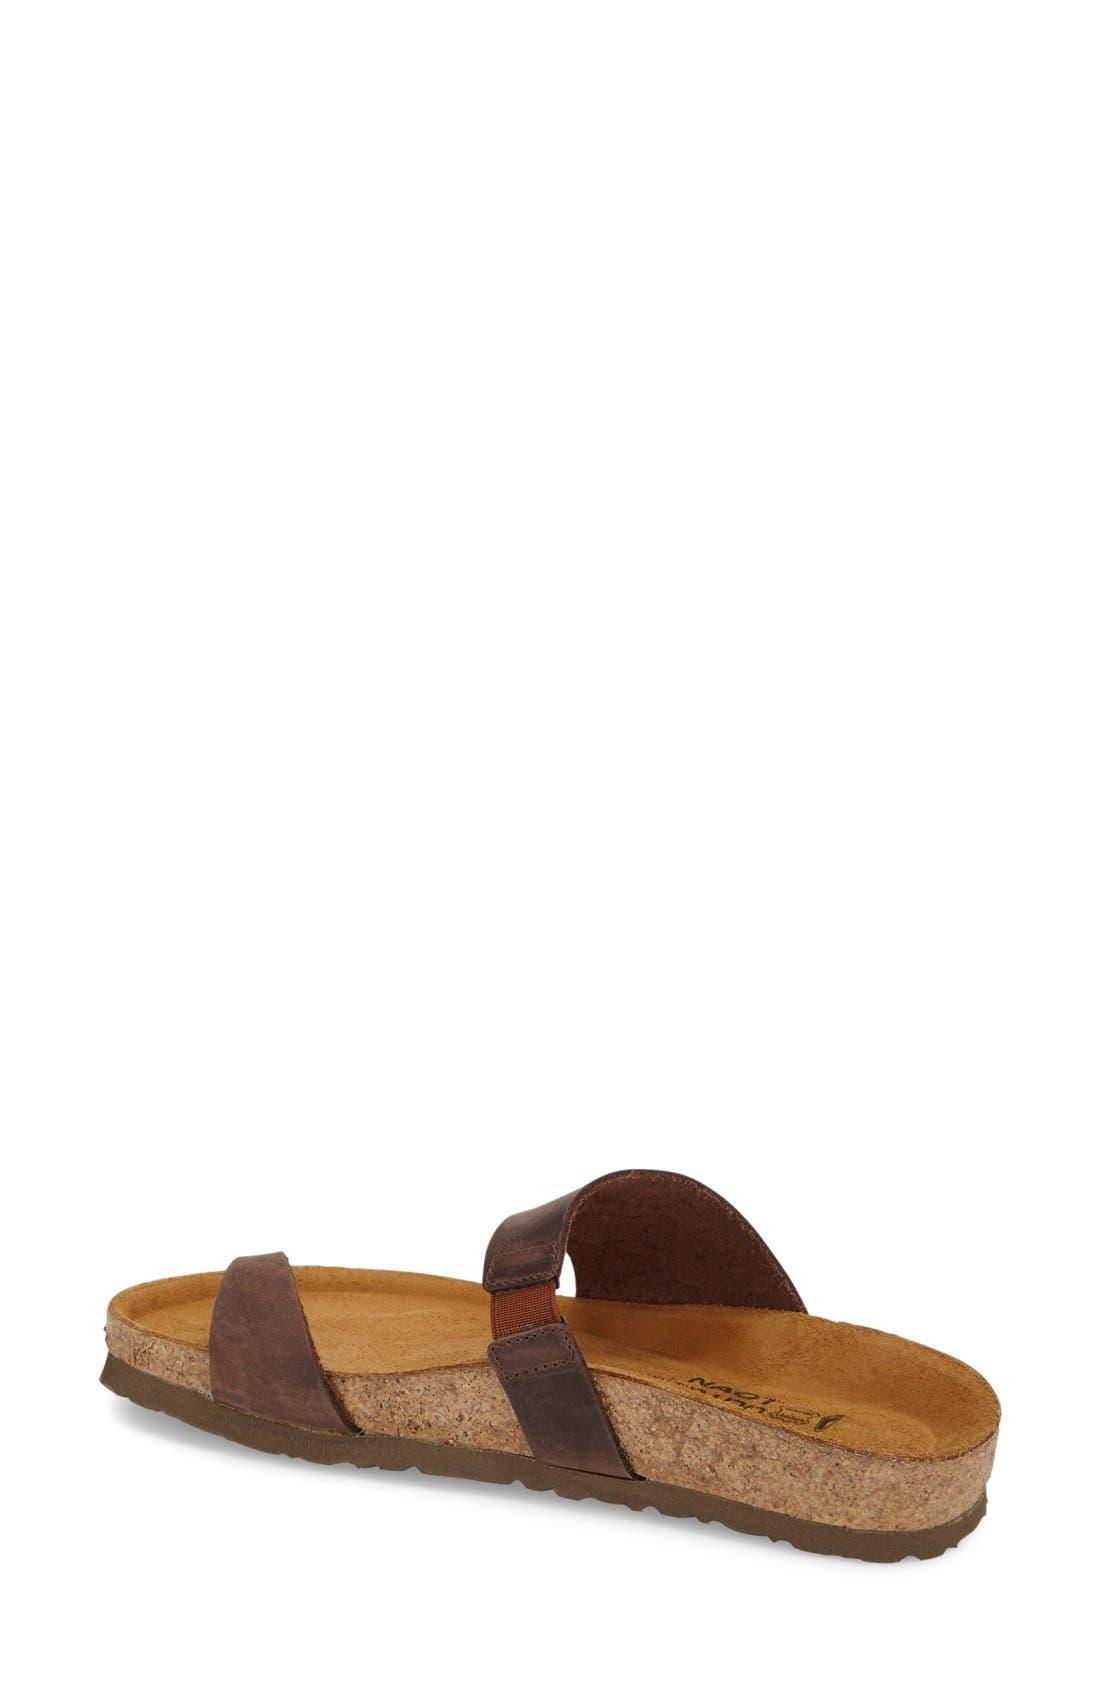 'Santa Fe' Sandal,                             Alternate thumbnail 2, color,                             200